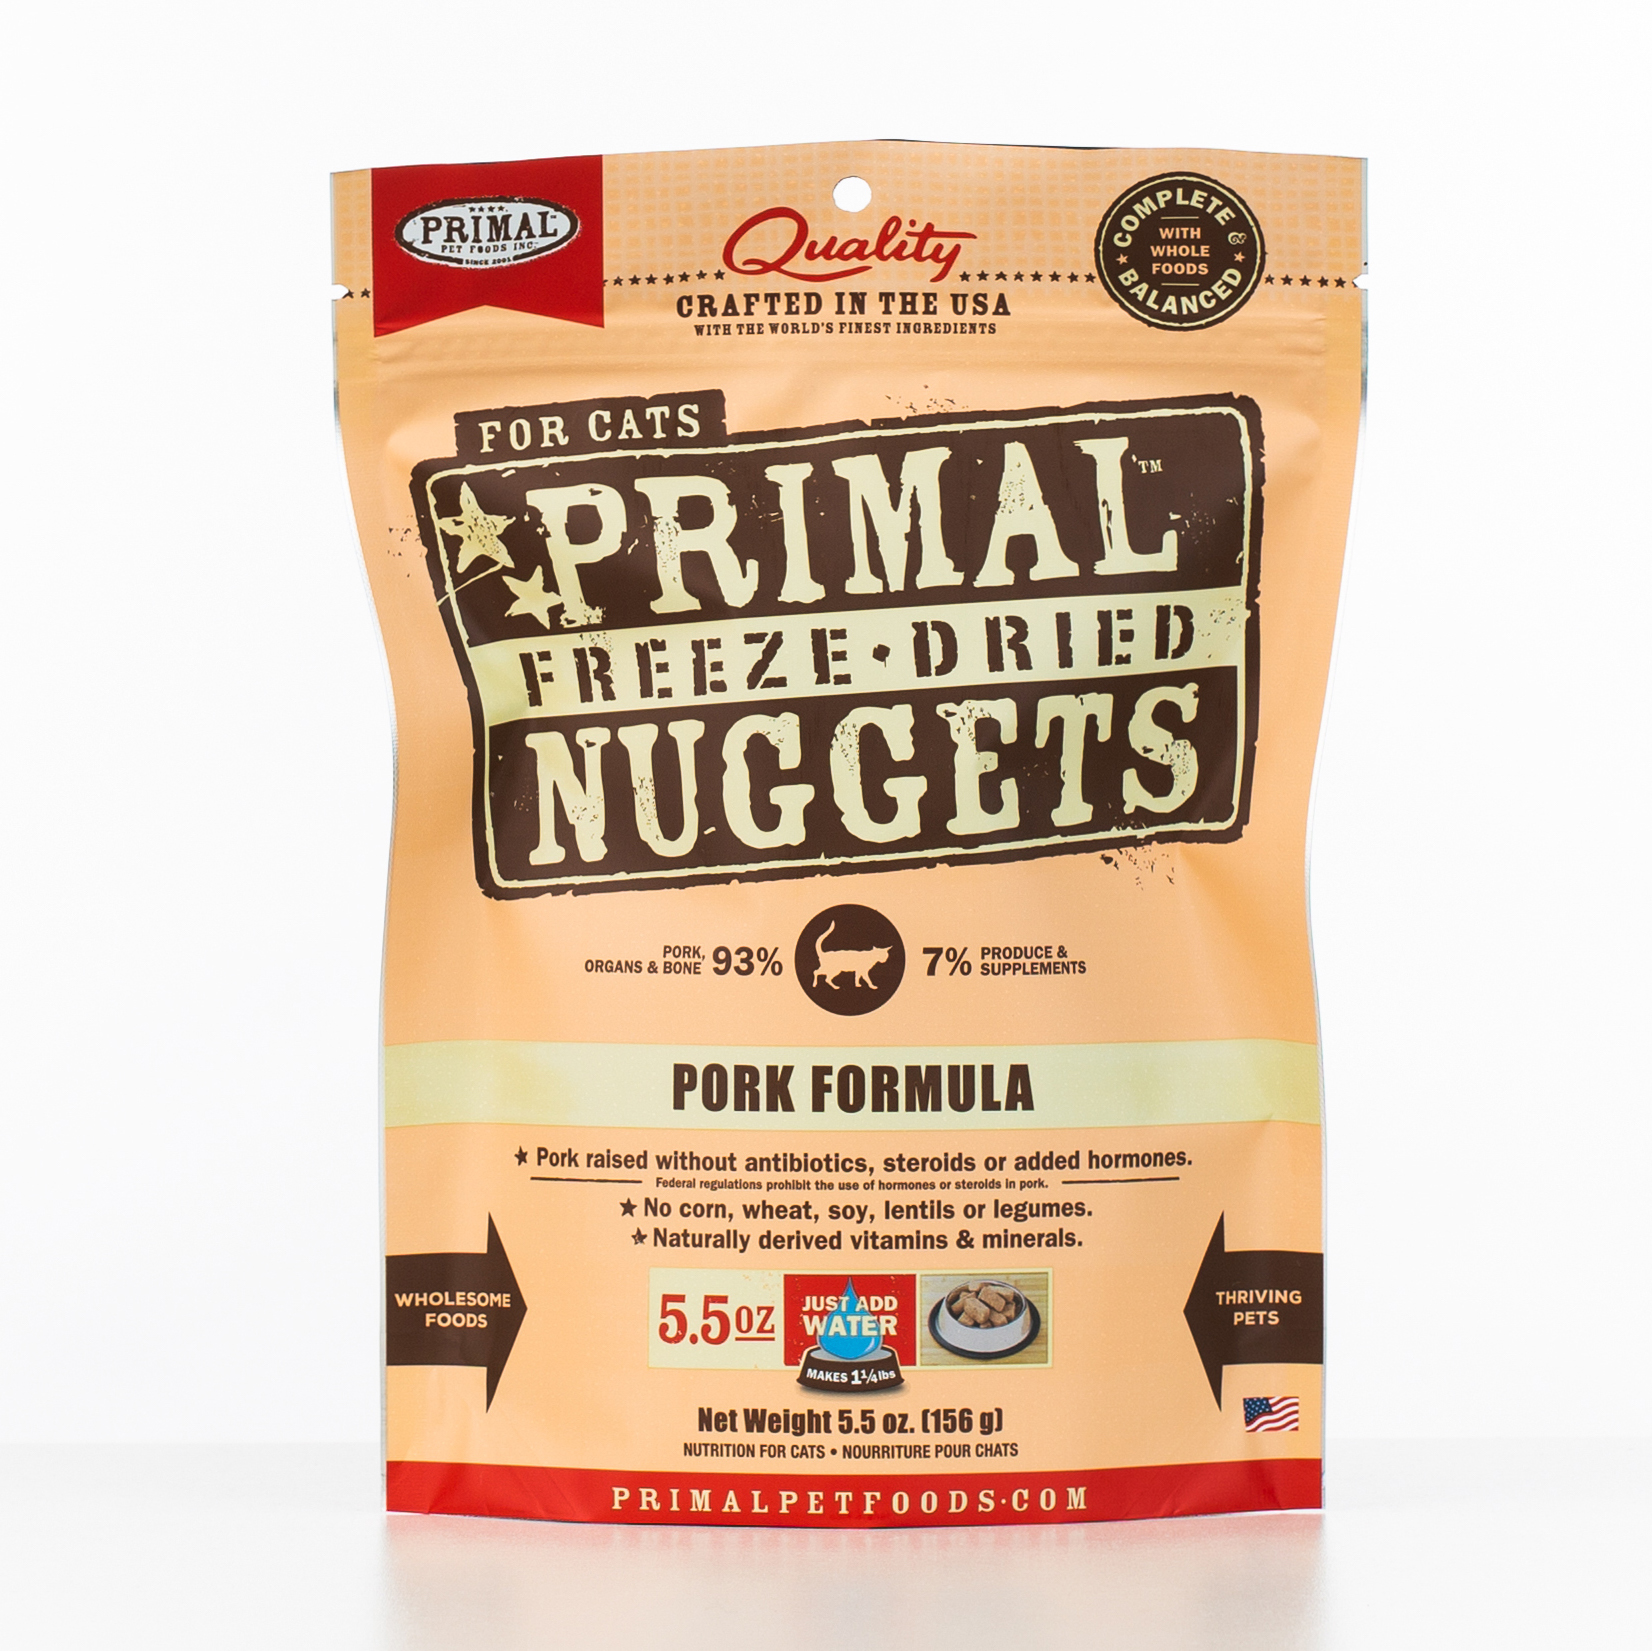 Primal Raw Freeze-Dried Nuggets Pork Formula Cat Food Image